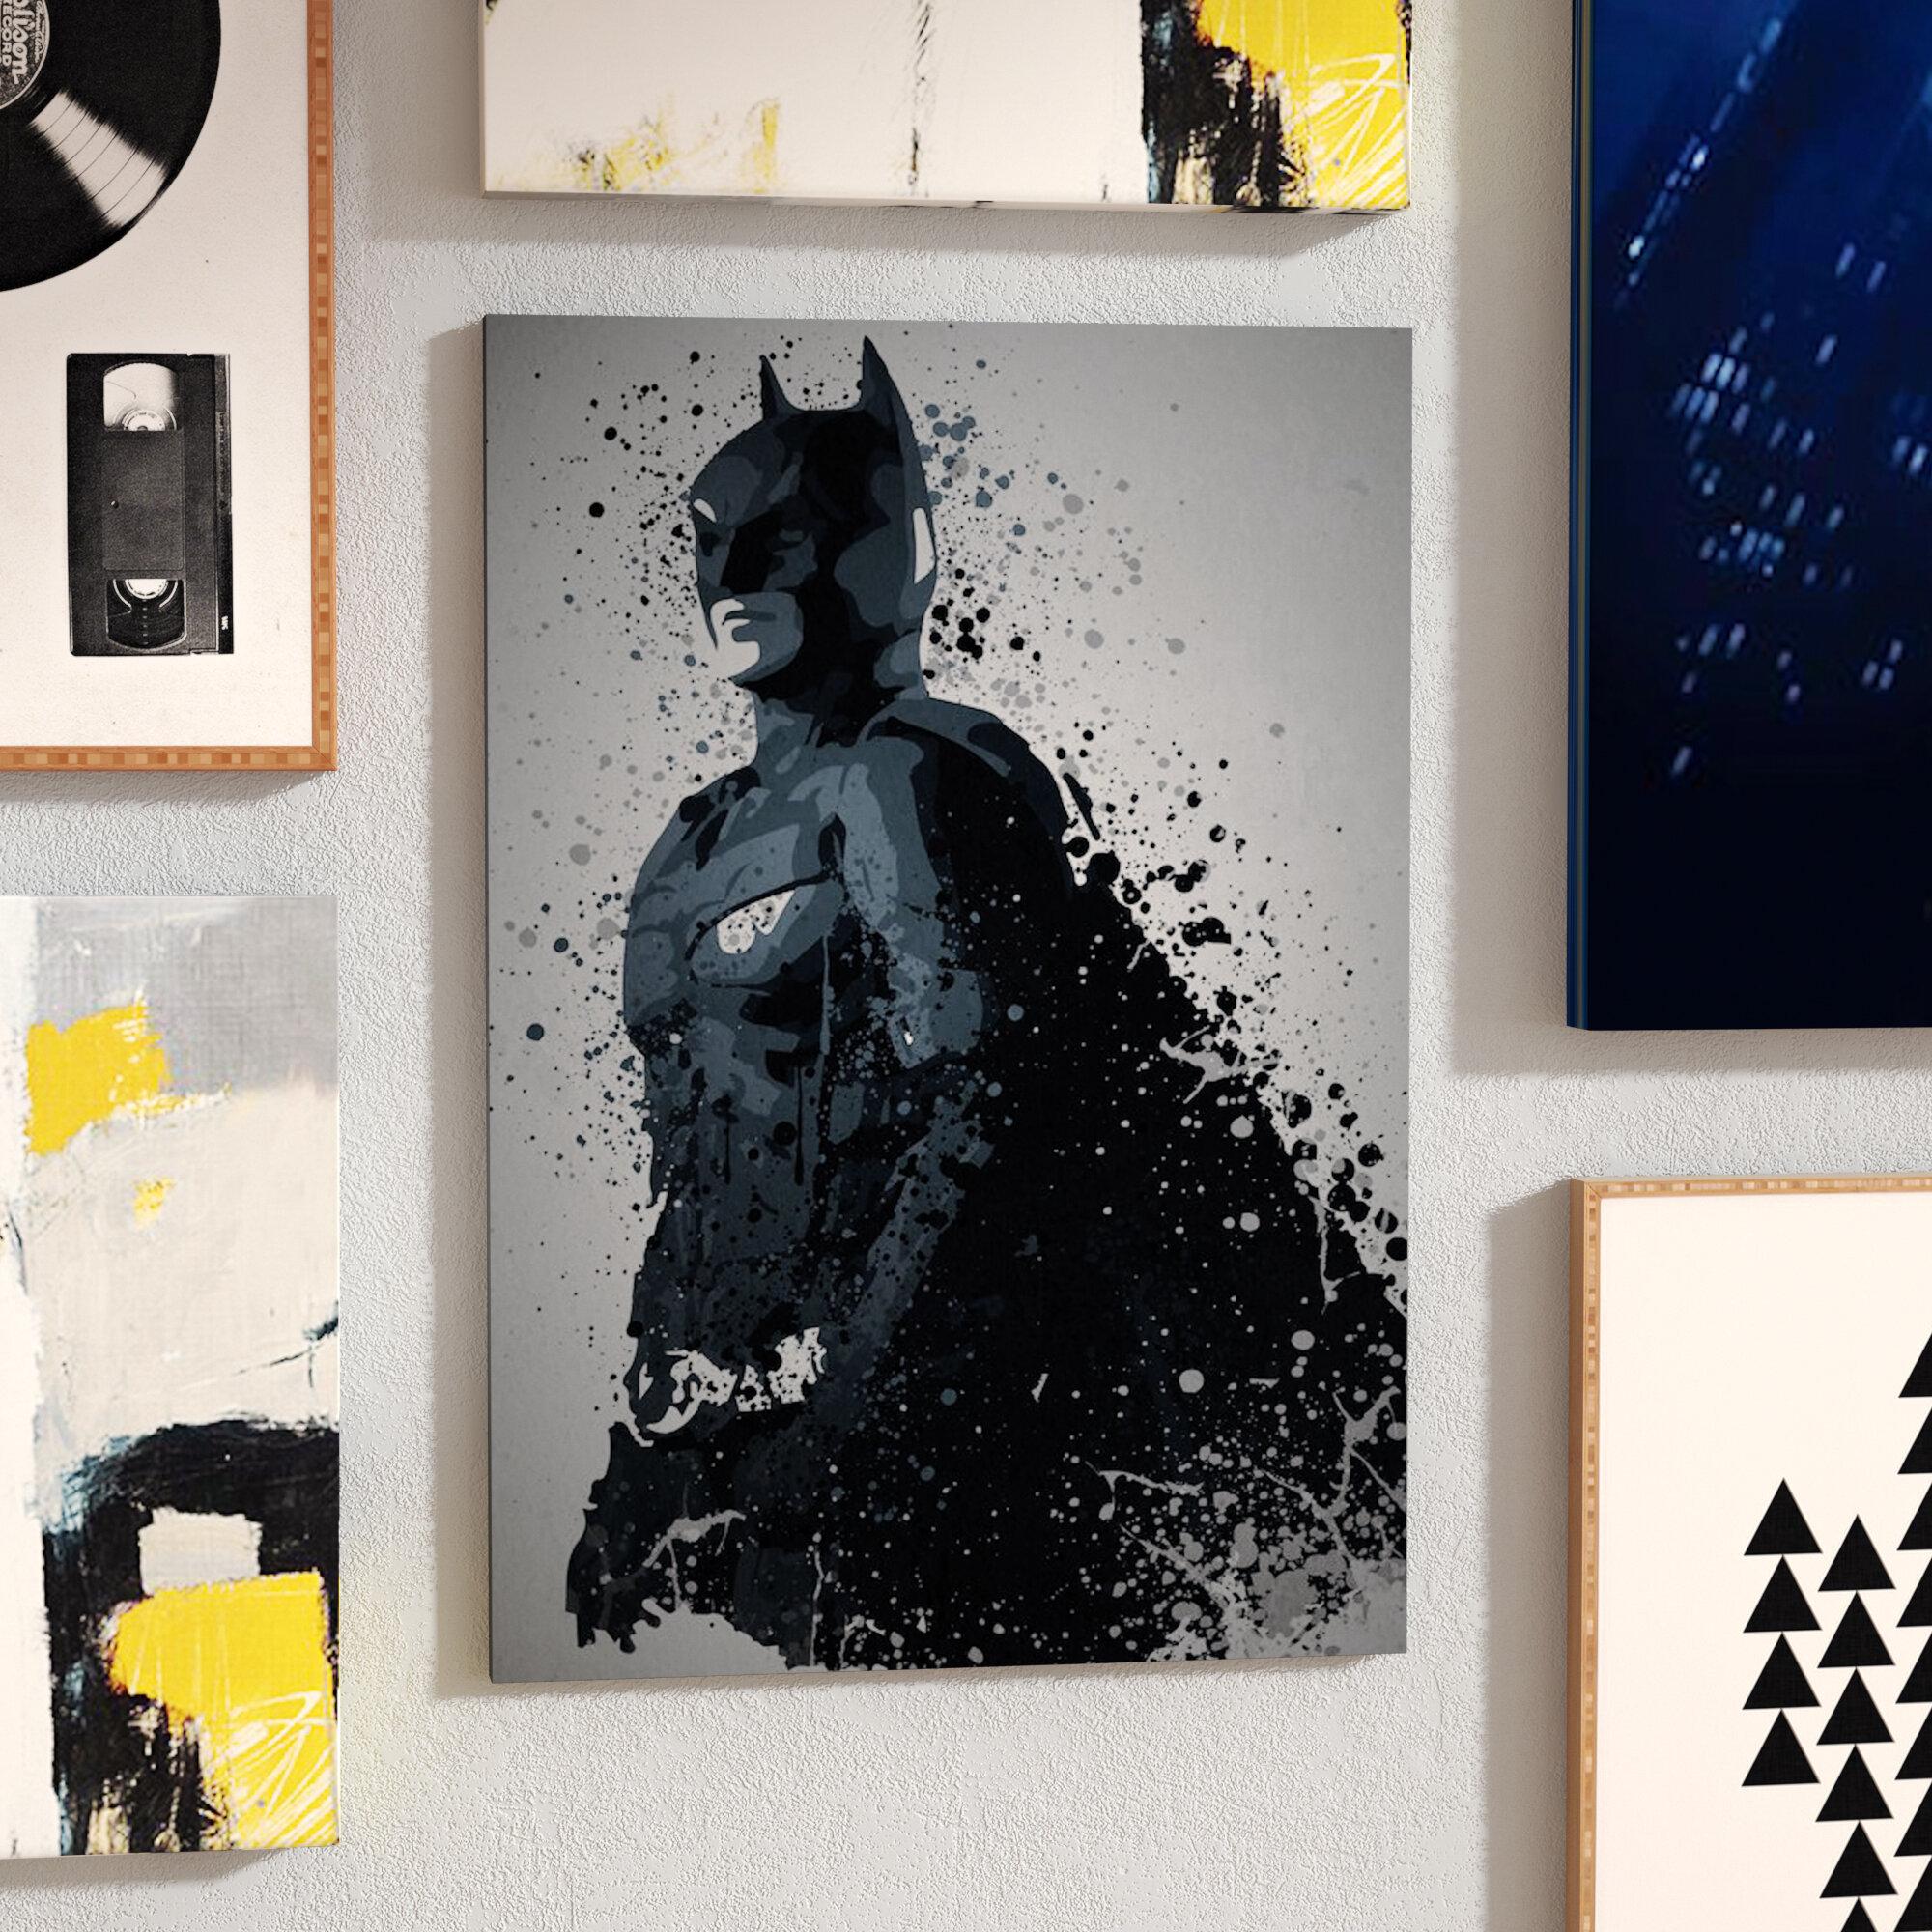 BATMAN ICONIC MOVIE POP ART CONTEMPORARY CANVAS PRINT READY TO HANG